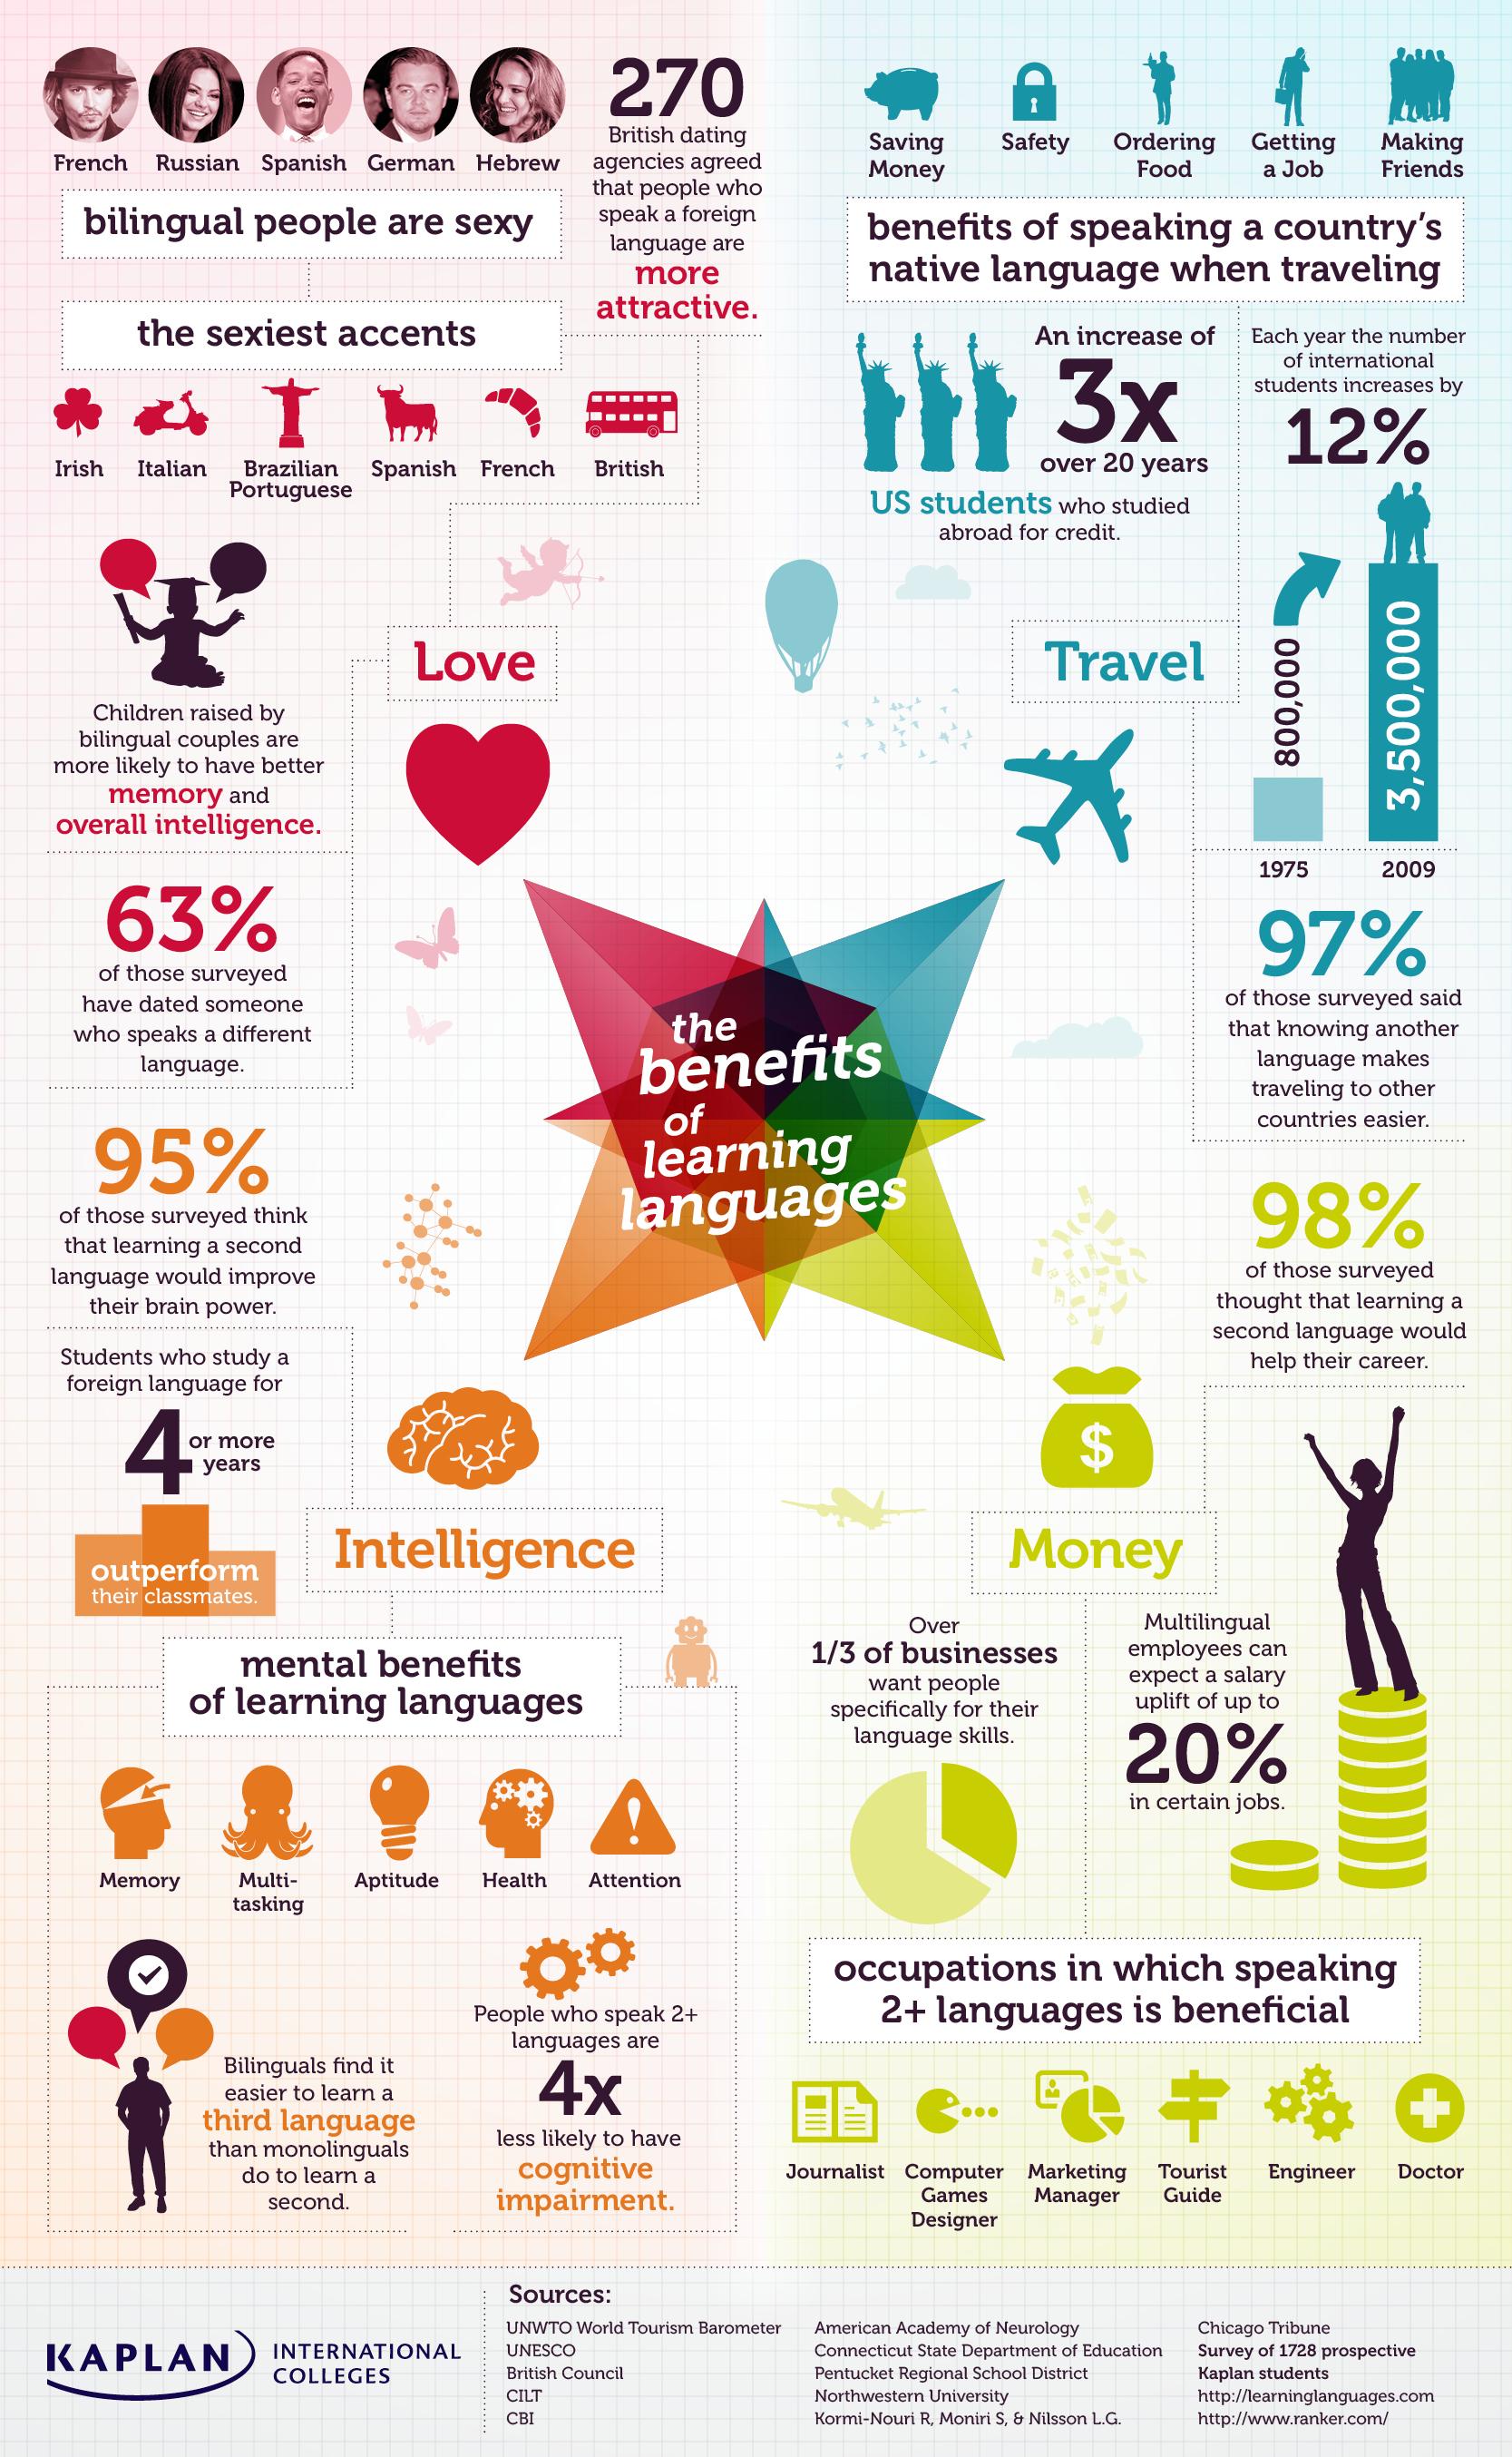 Infographic credit:Netdna-cdn.com